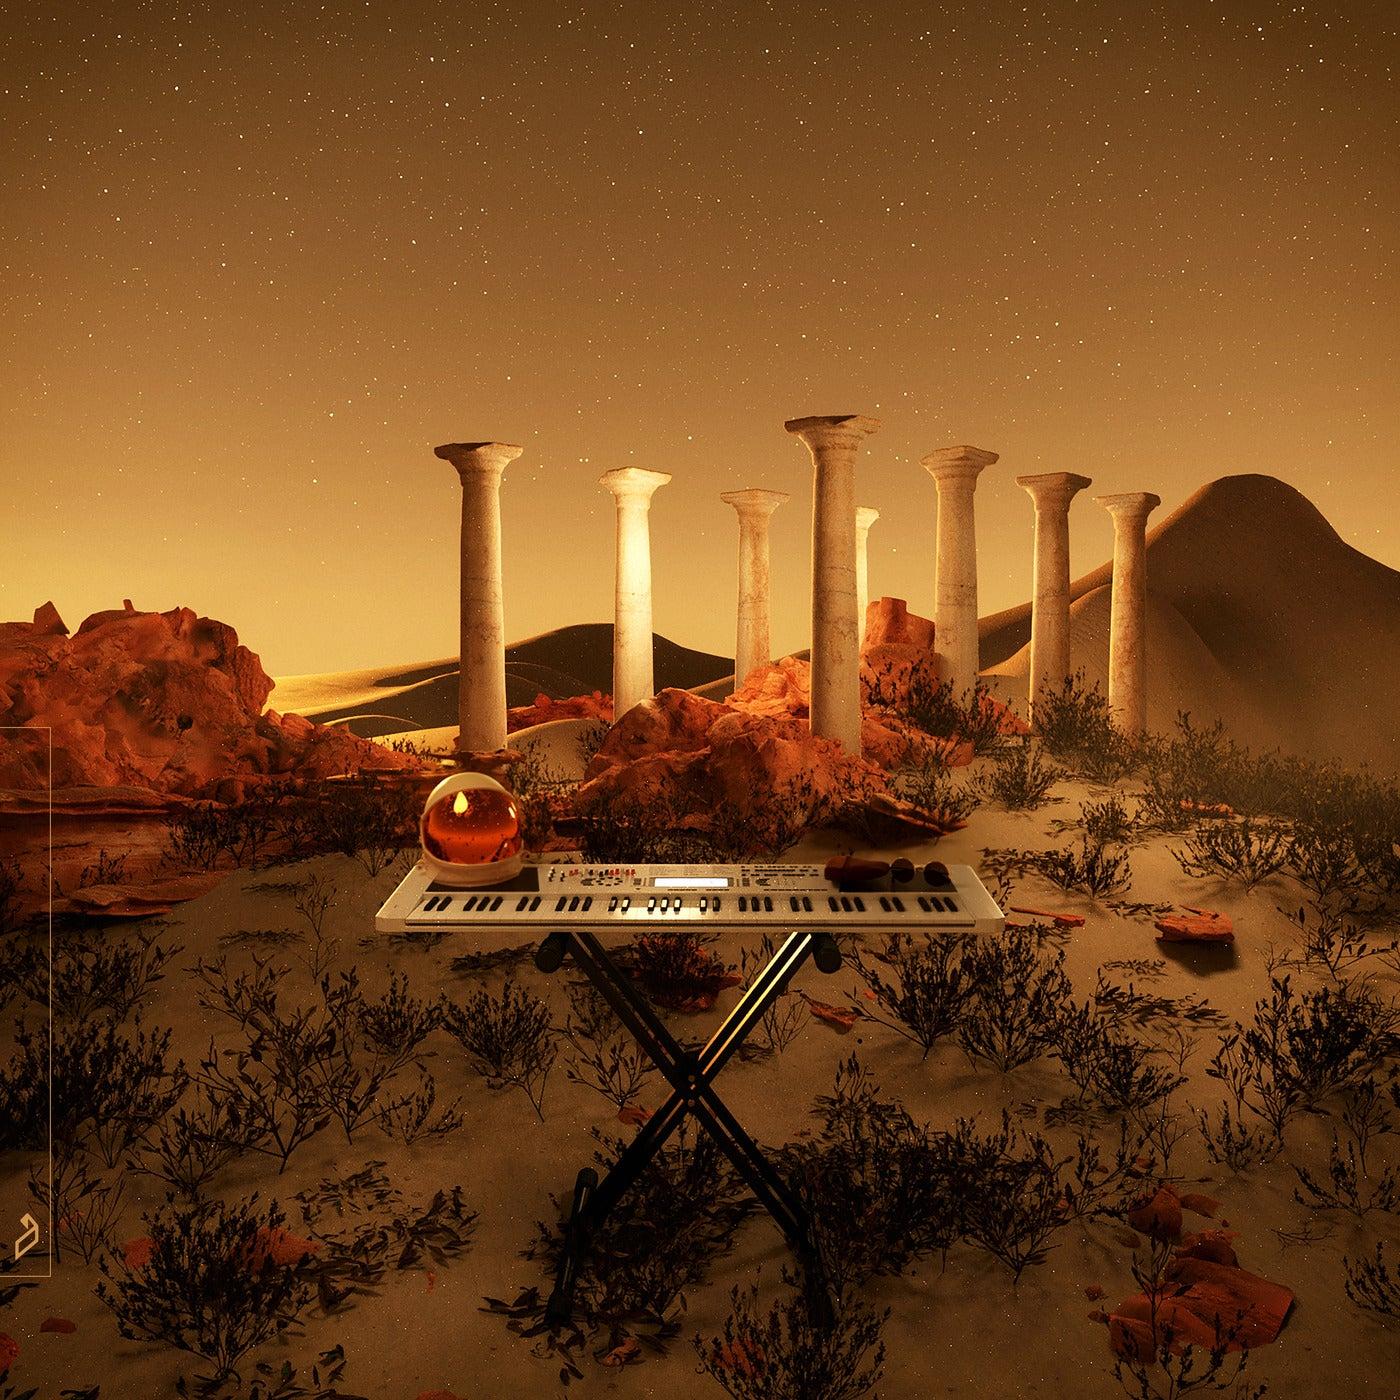 Breakfast On Mars (Extended Mix)